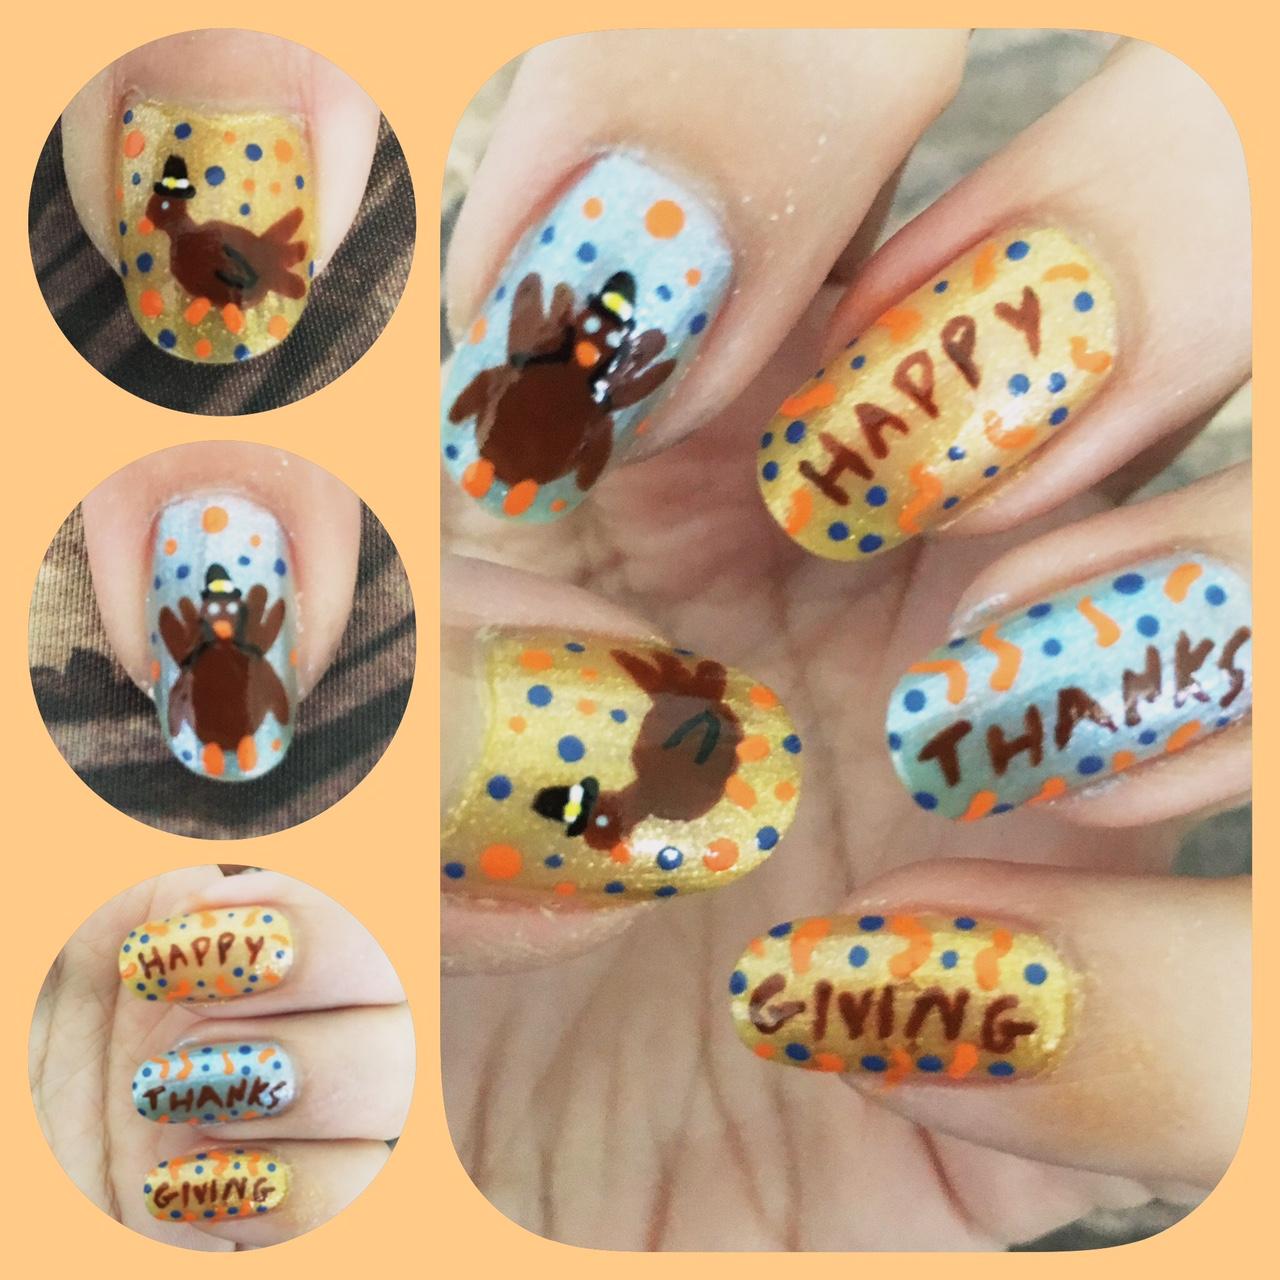 ThanksGiving Nail Art Left by AzureMikari